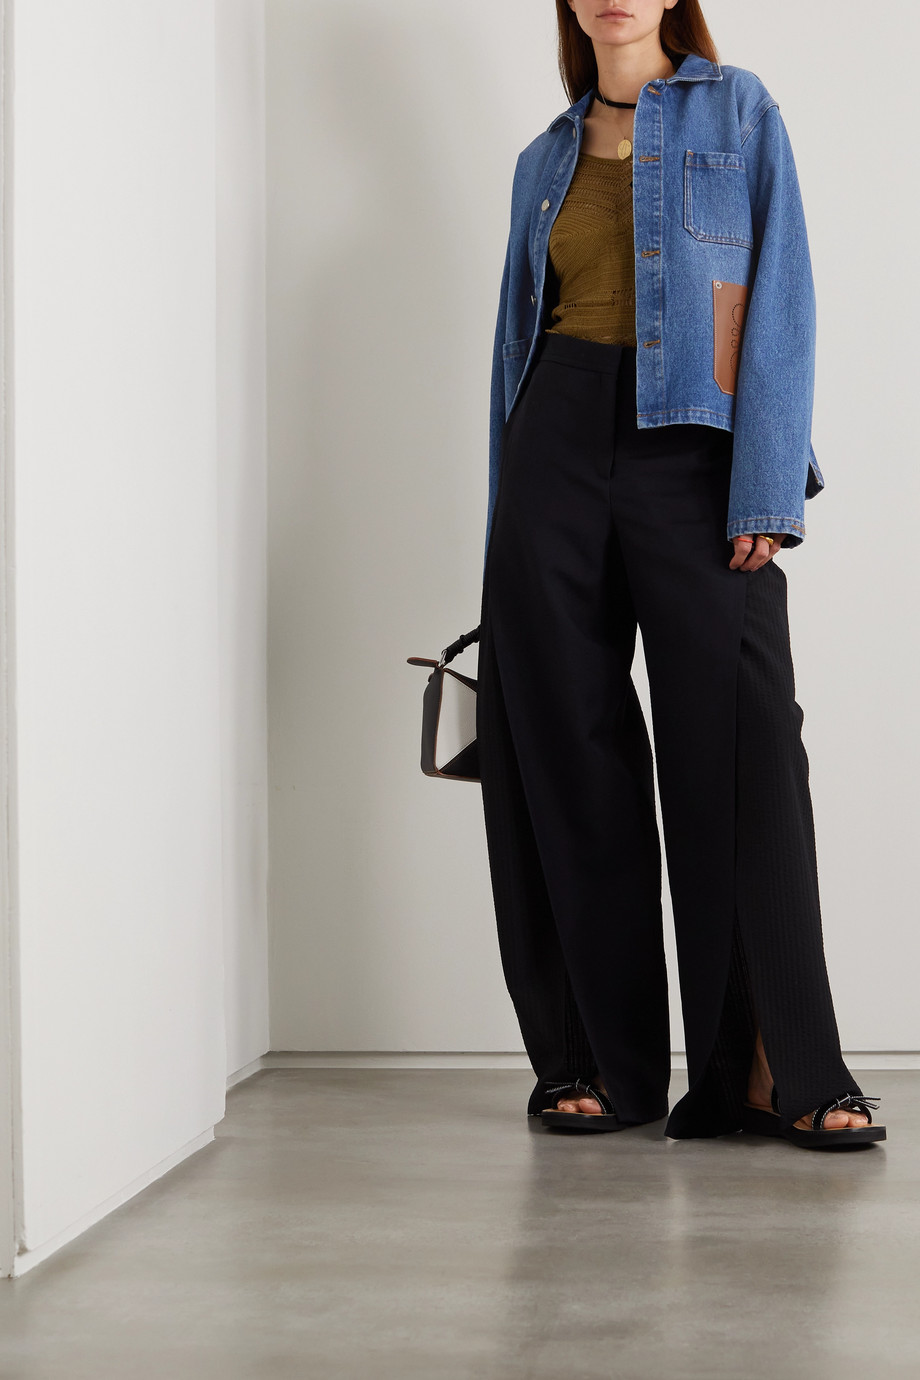 Loewe Veste en jean à finitions en cuir